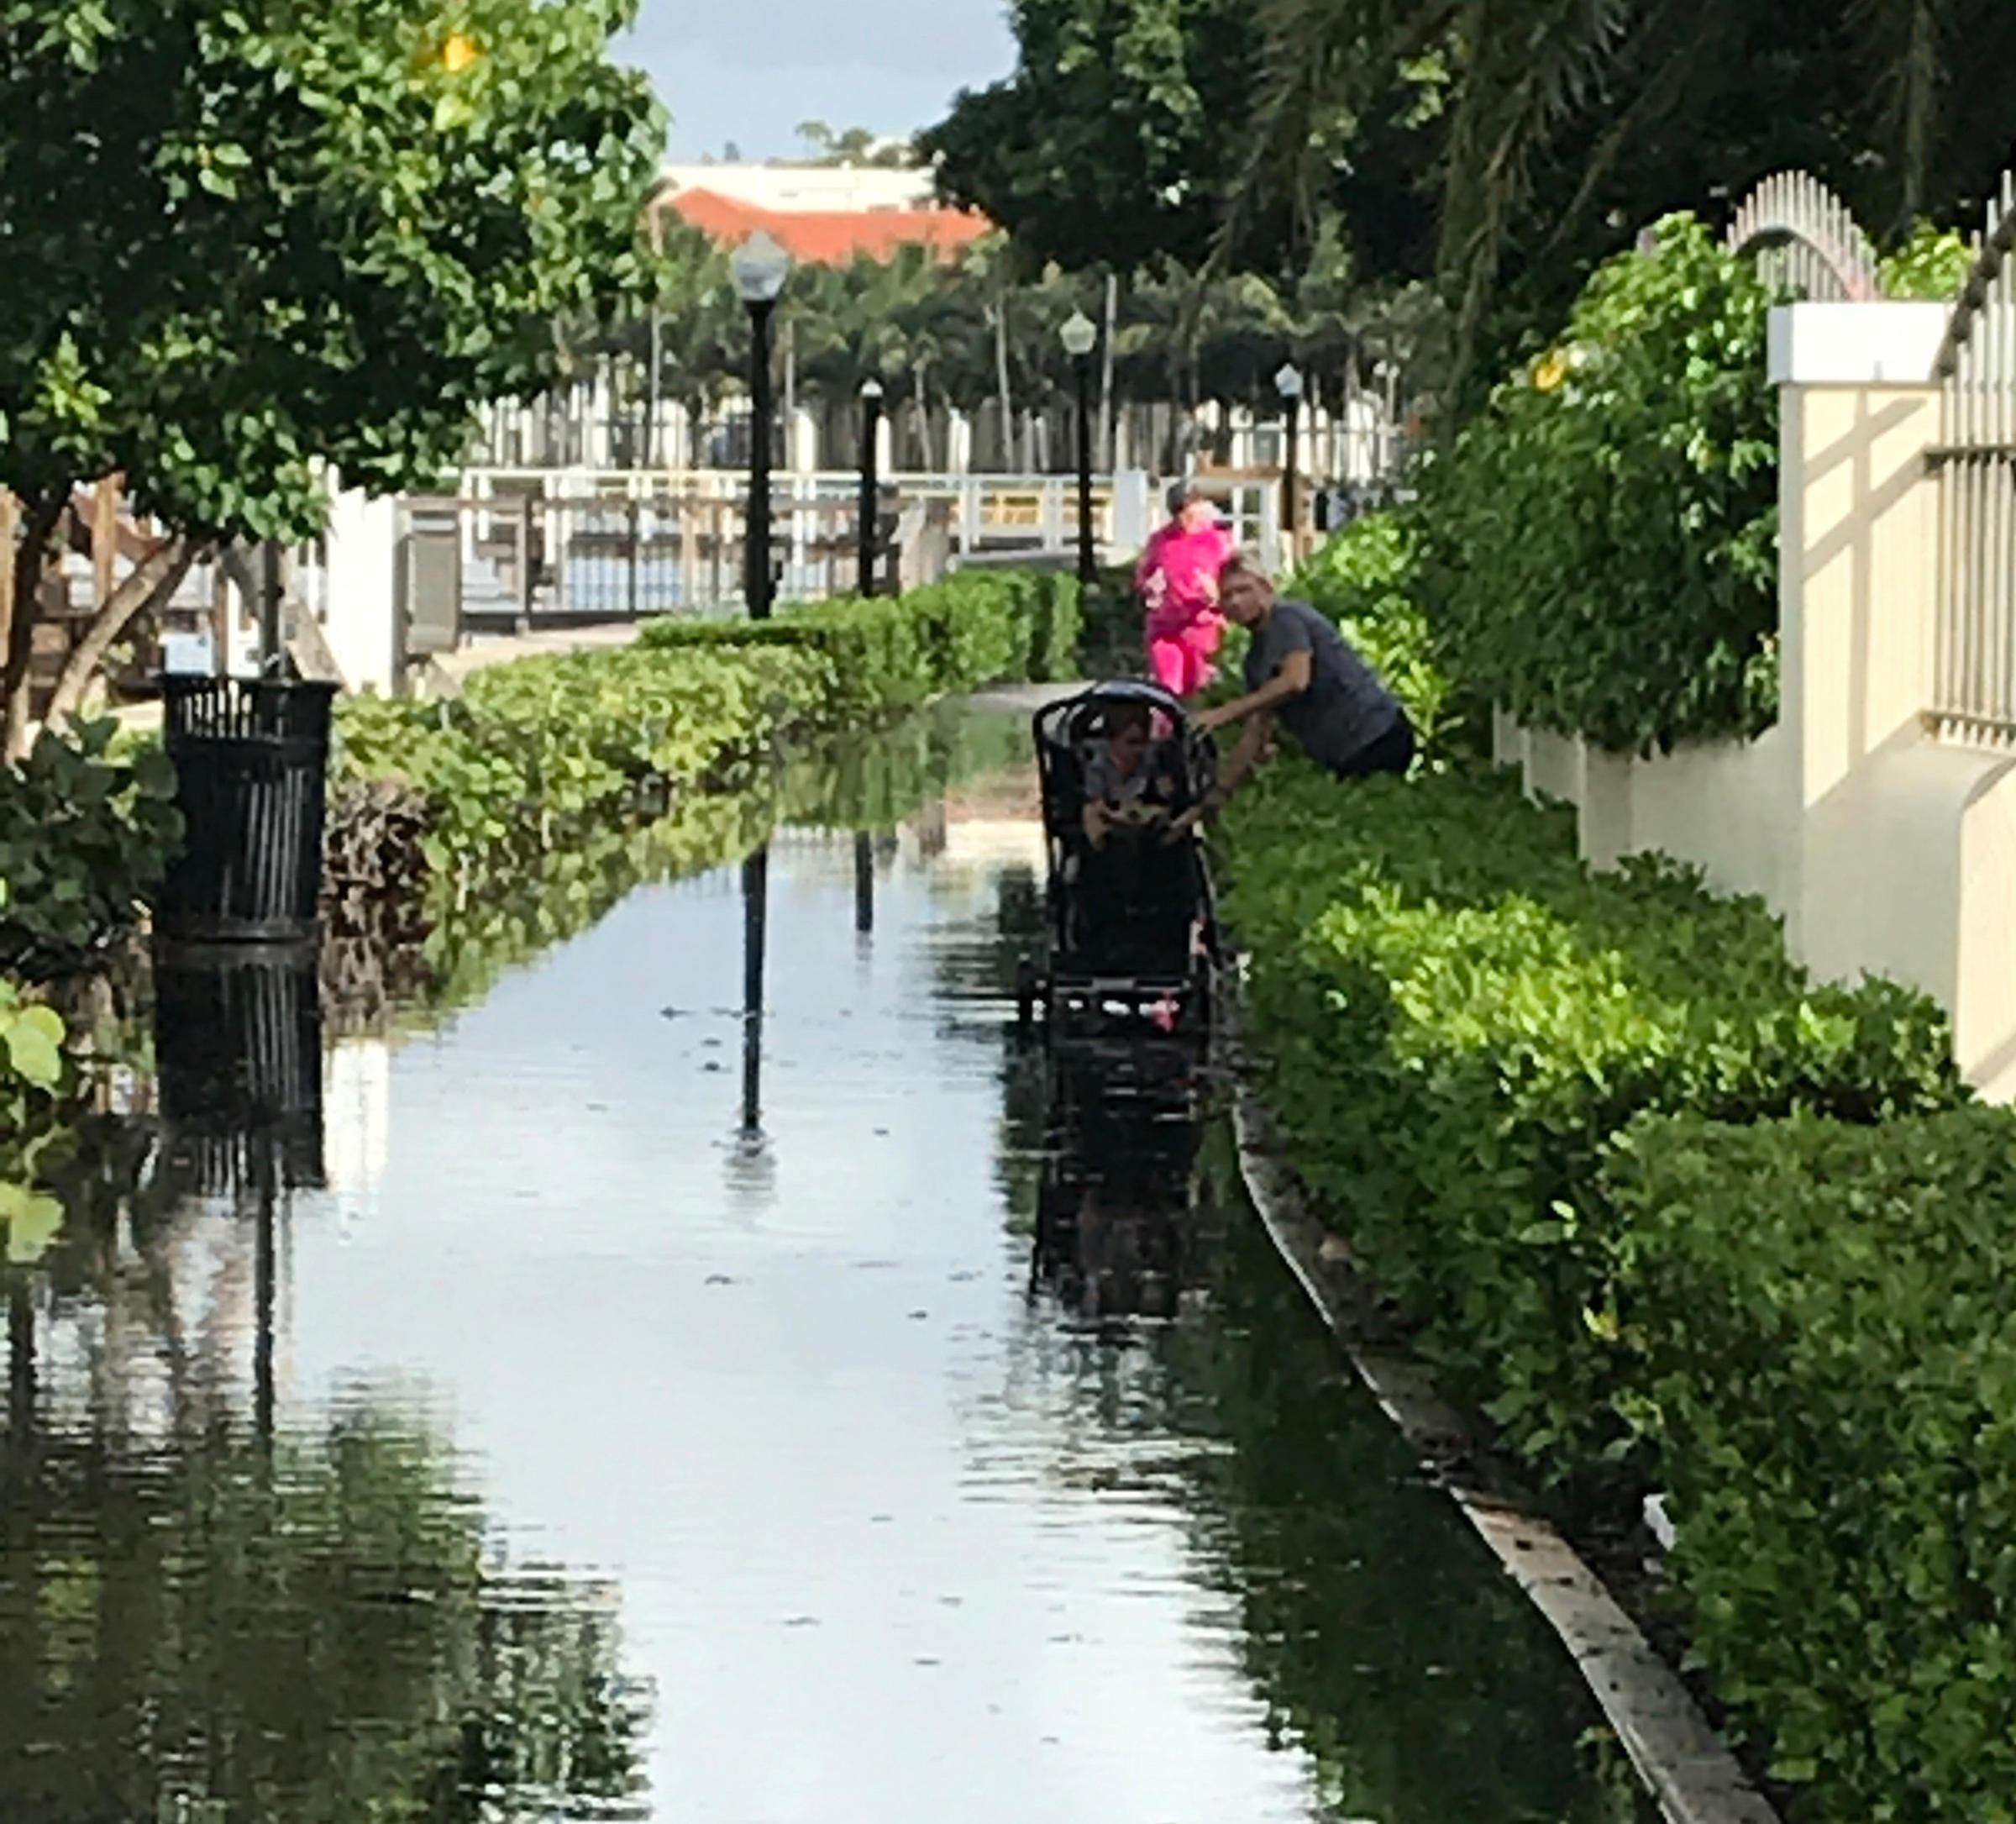 King Tide Gives South Florida A Taste Of Life Underwater | WLRN